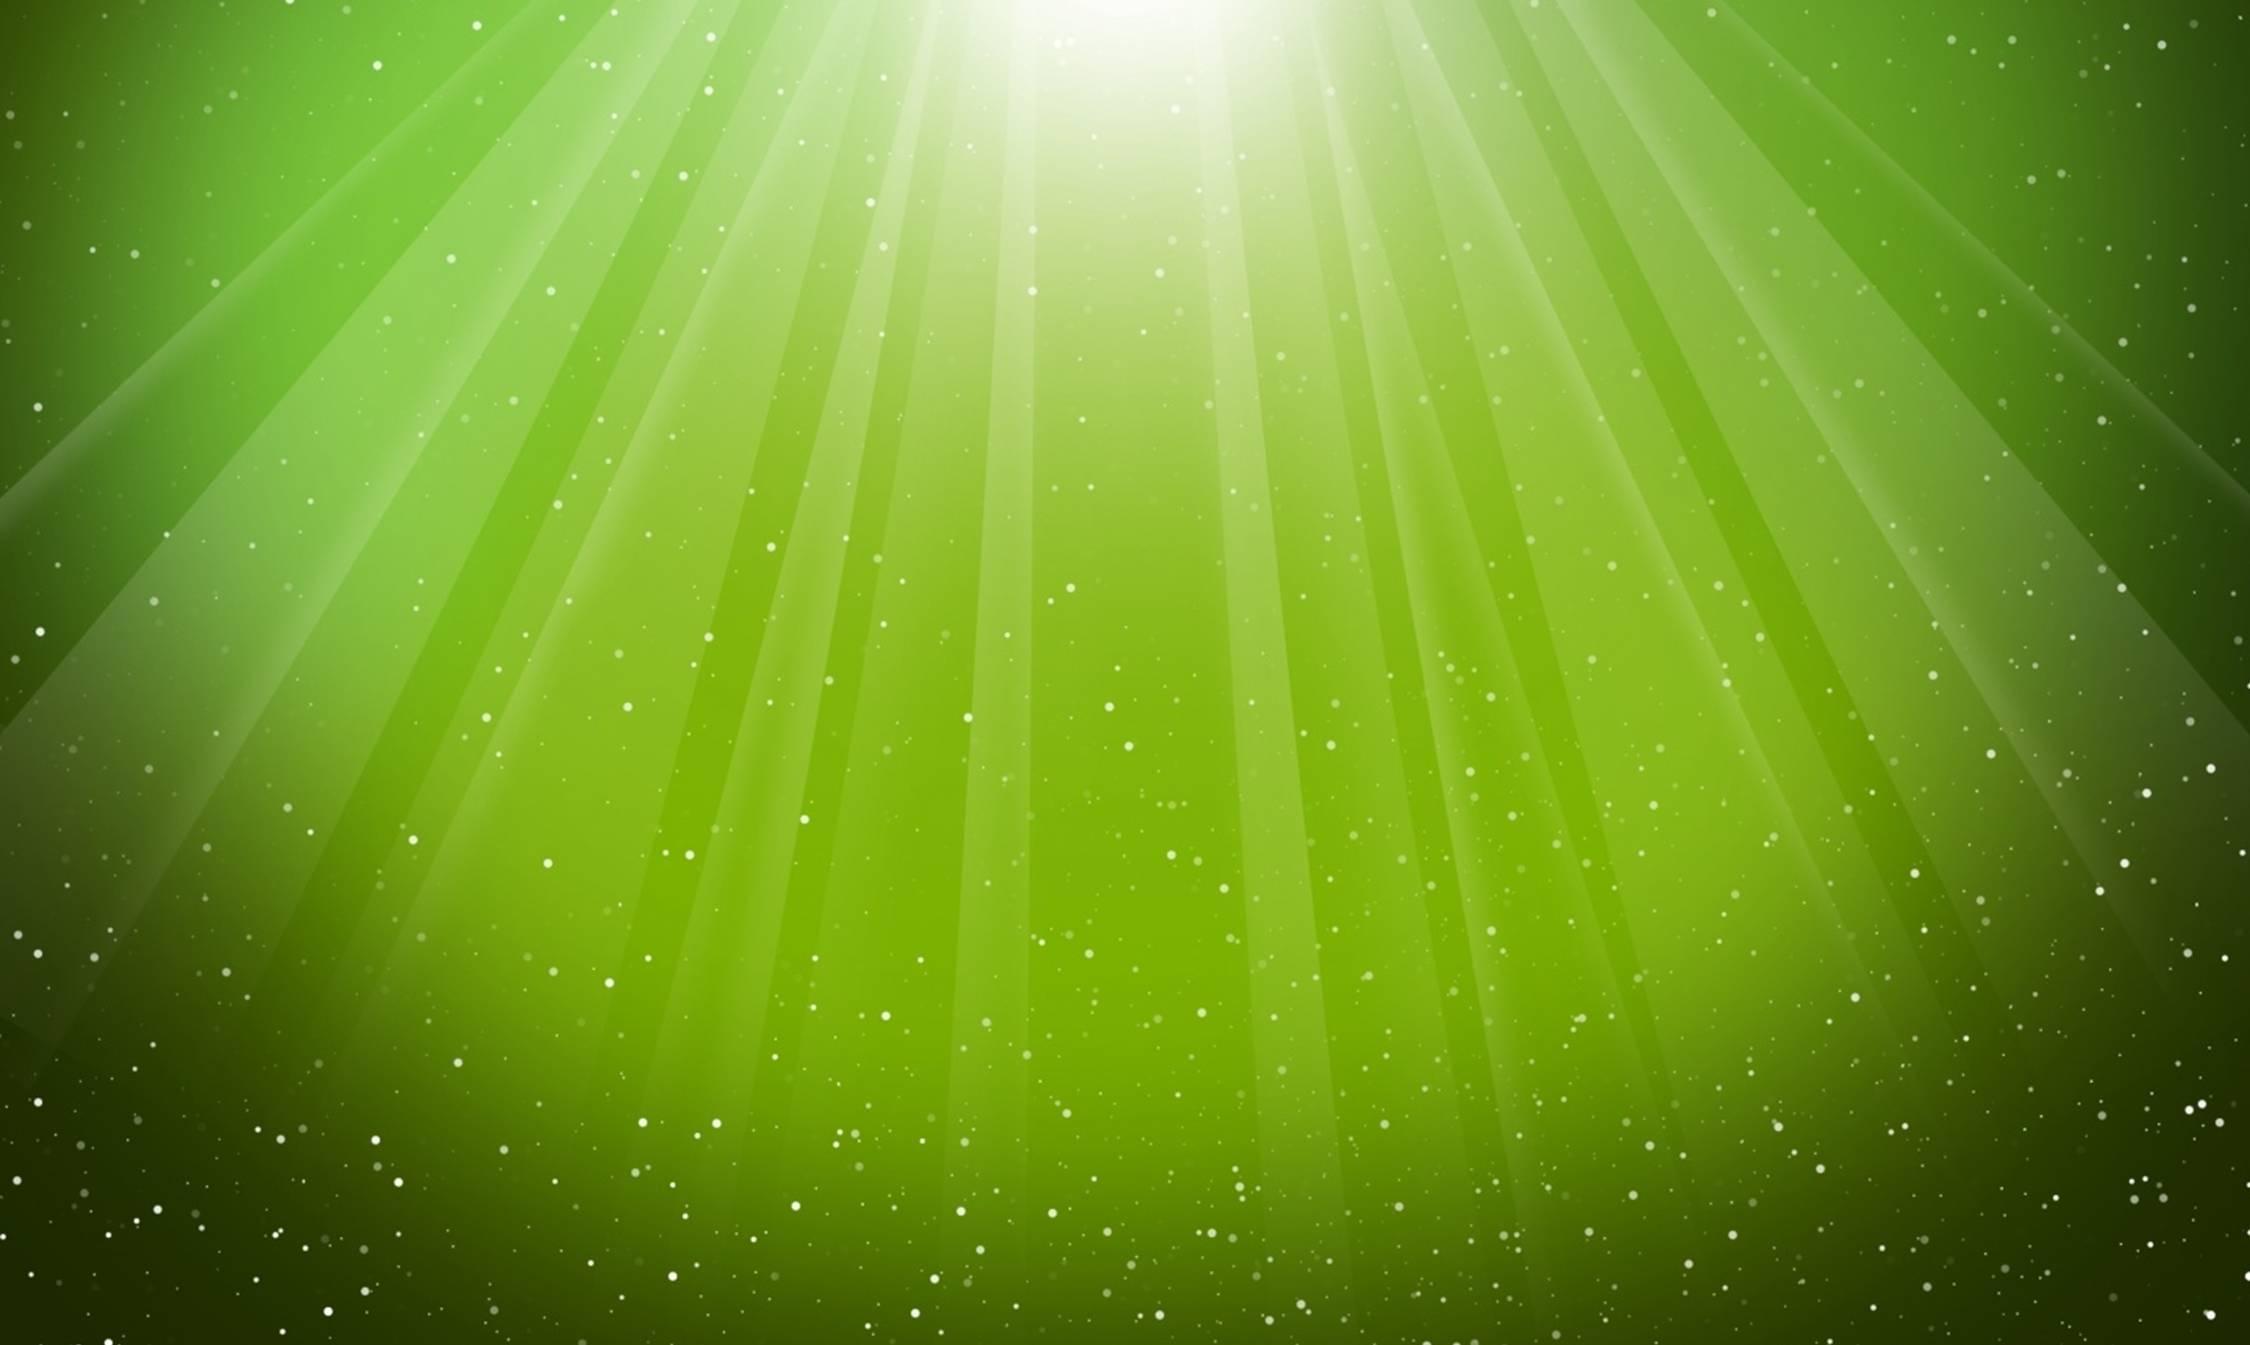 aurora_burst_lime